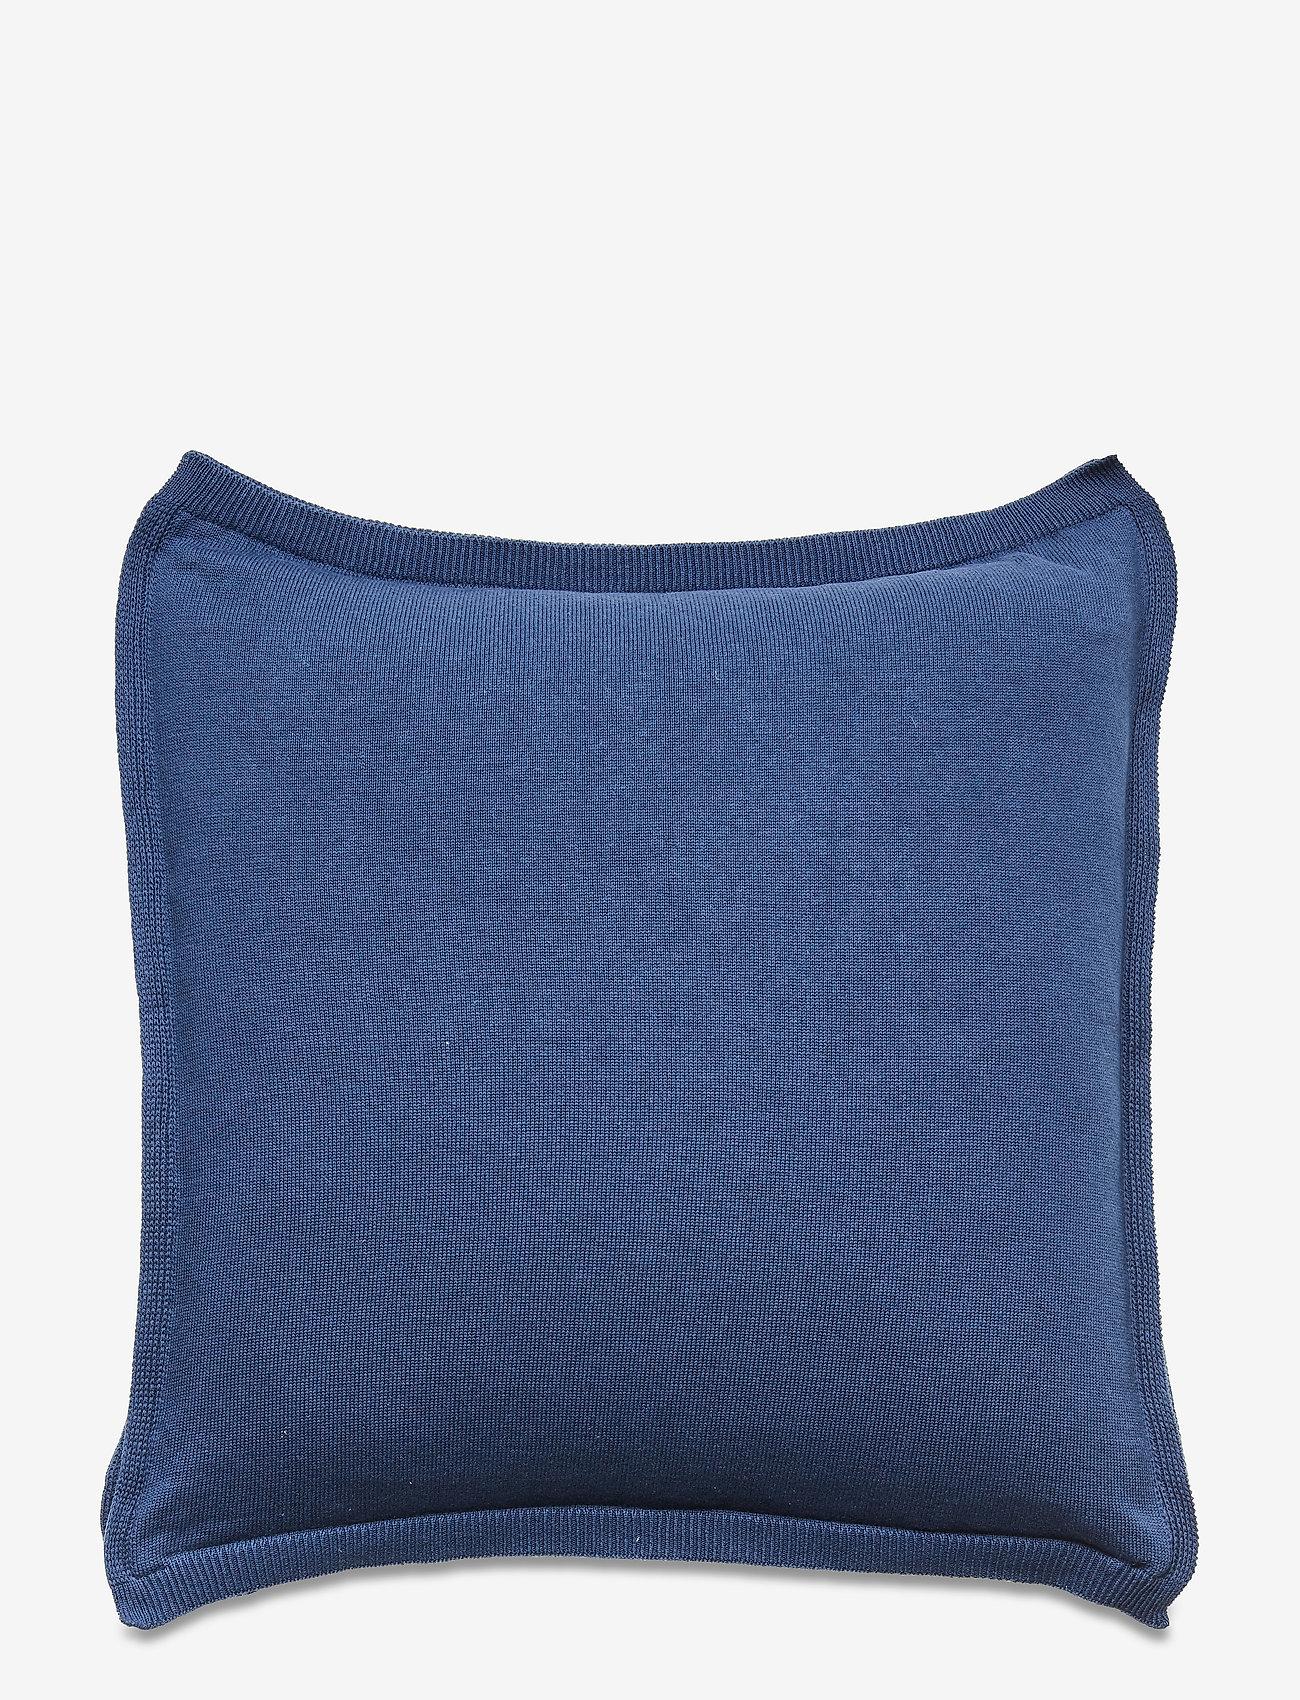 GANT - TRELL KNIT CUSHION COVER - poduszki ozdobne - insignia blue - 1